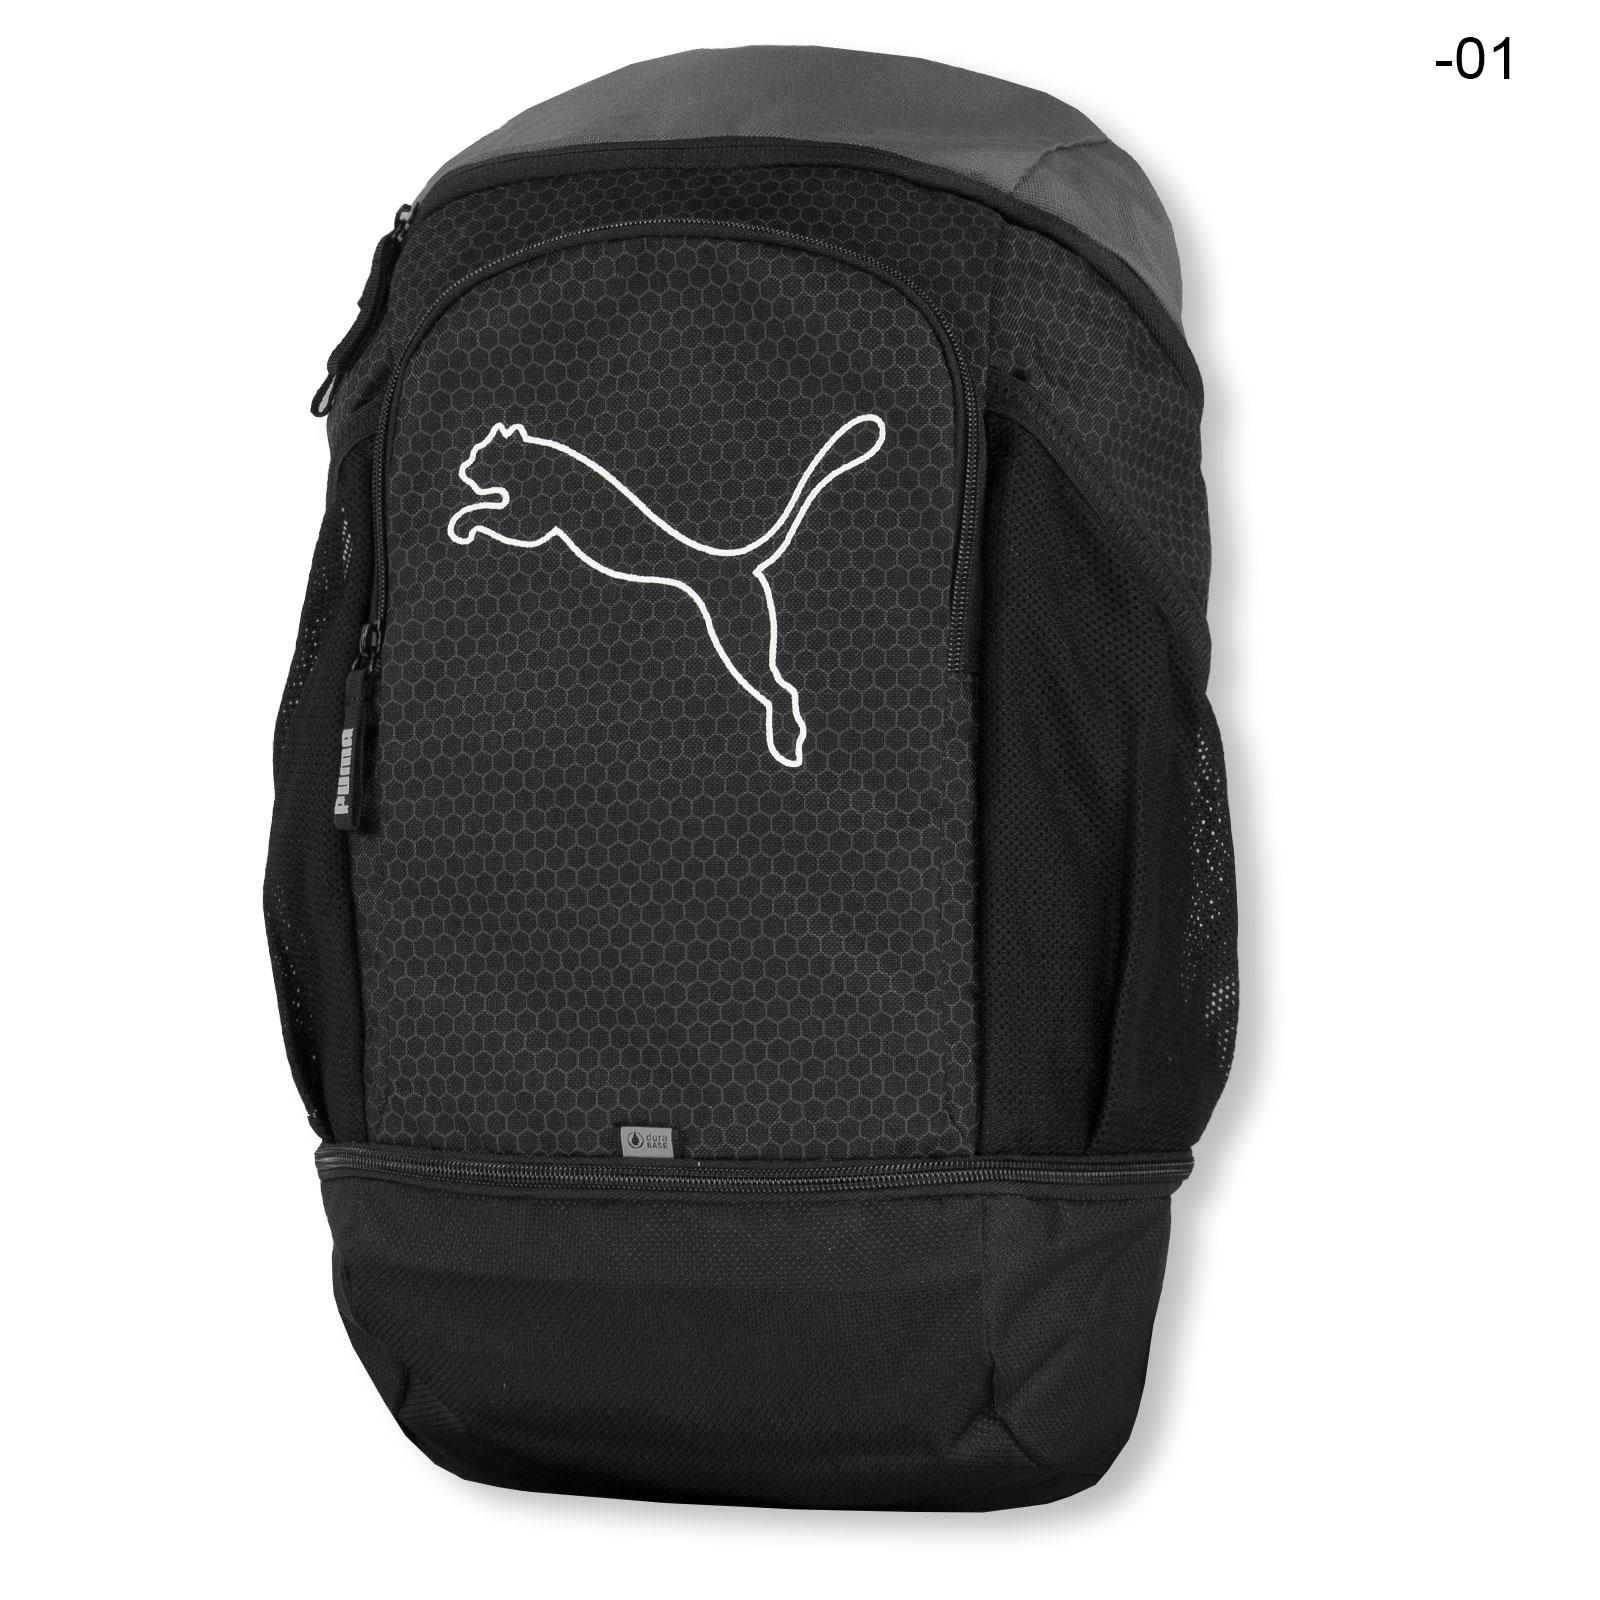 16fc06d63ce37 PUMA Echo Backpack Rucksack für Sport Freizeit Reise Schule Outdoor 074396  in peacoat   vibrant orange ...